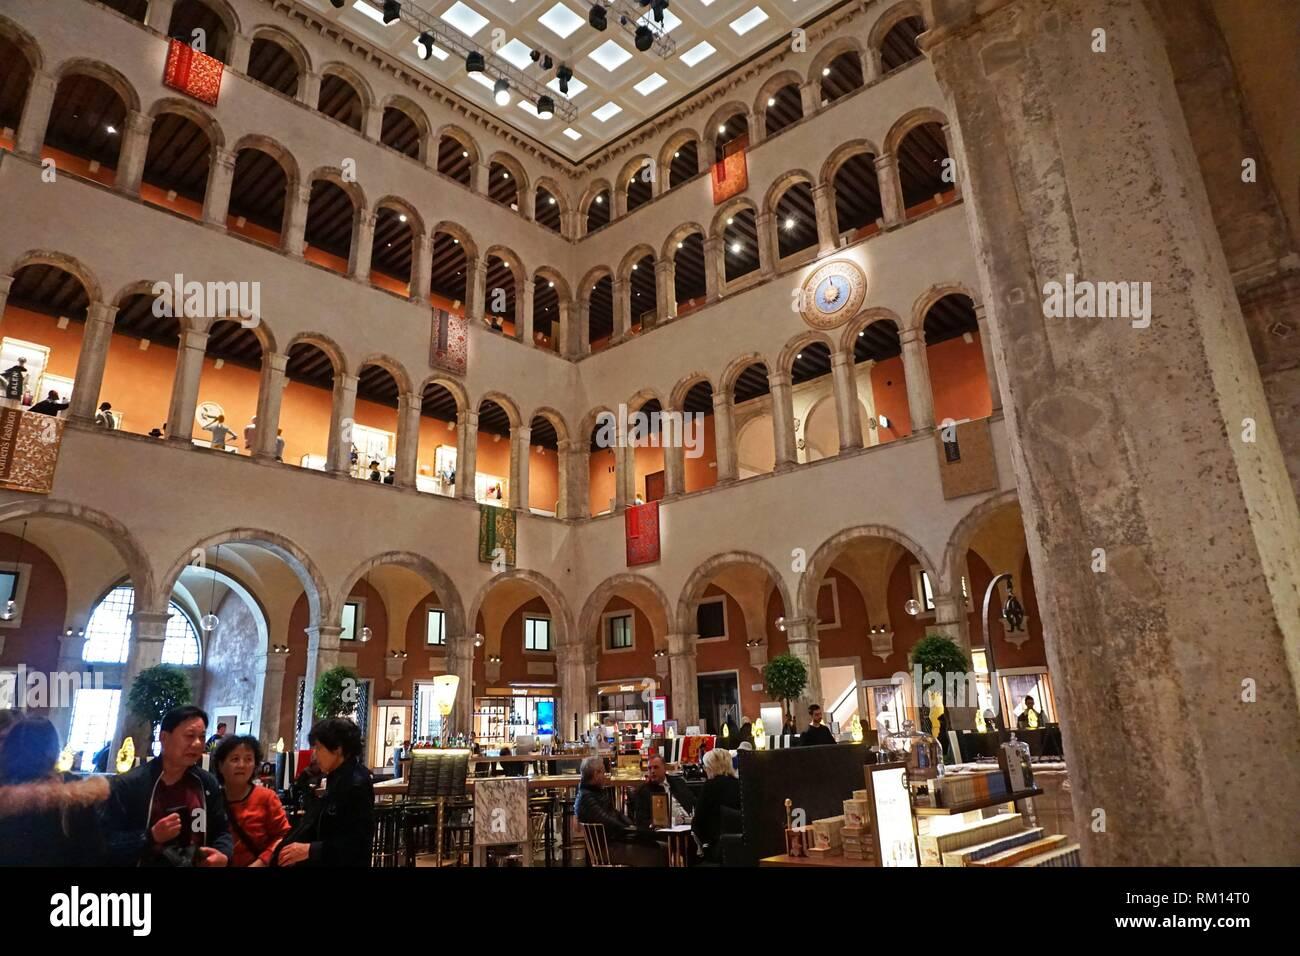 T Fondaco dei Tedeschi Department Store. Sestiere di San Marco. Venedig, Venetien, Italien, Europa. Stockfoto